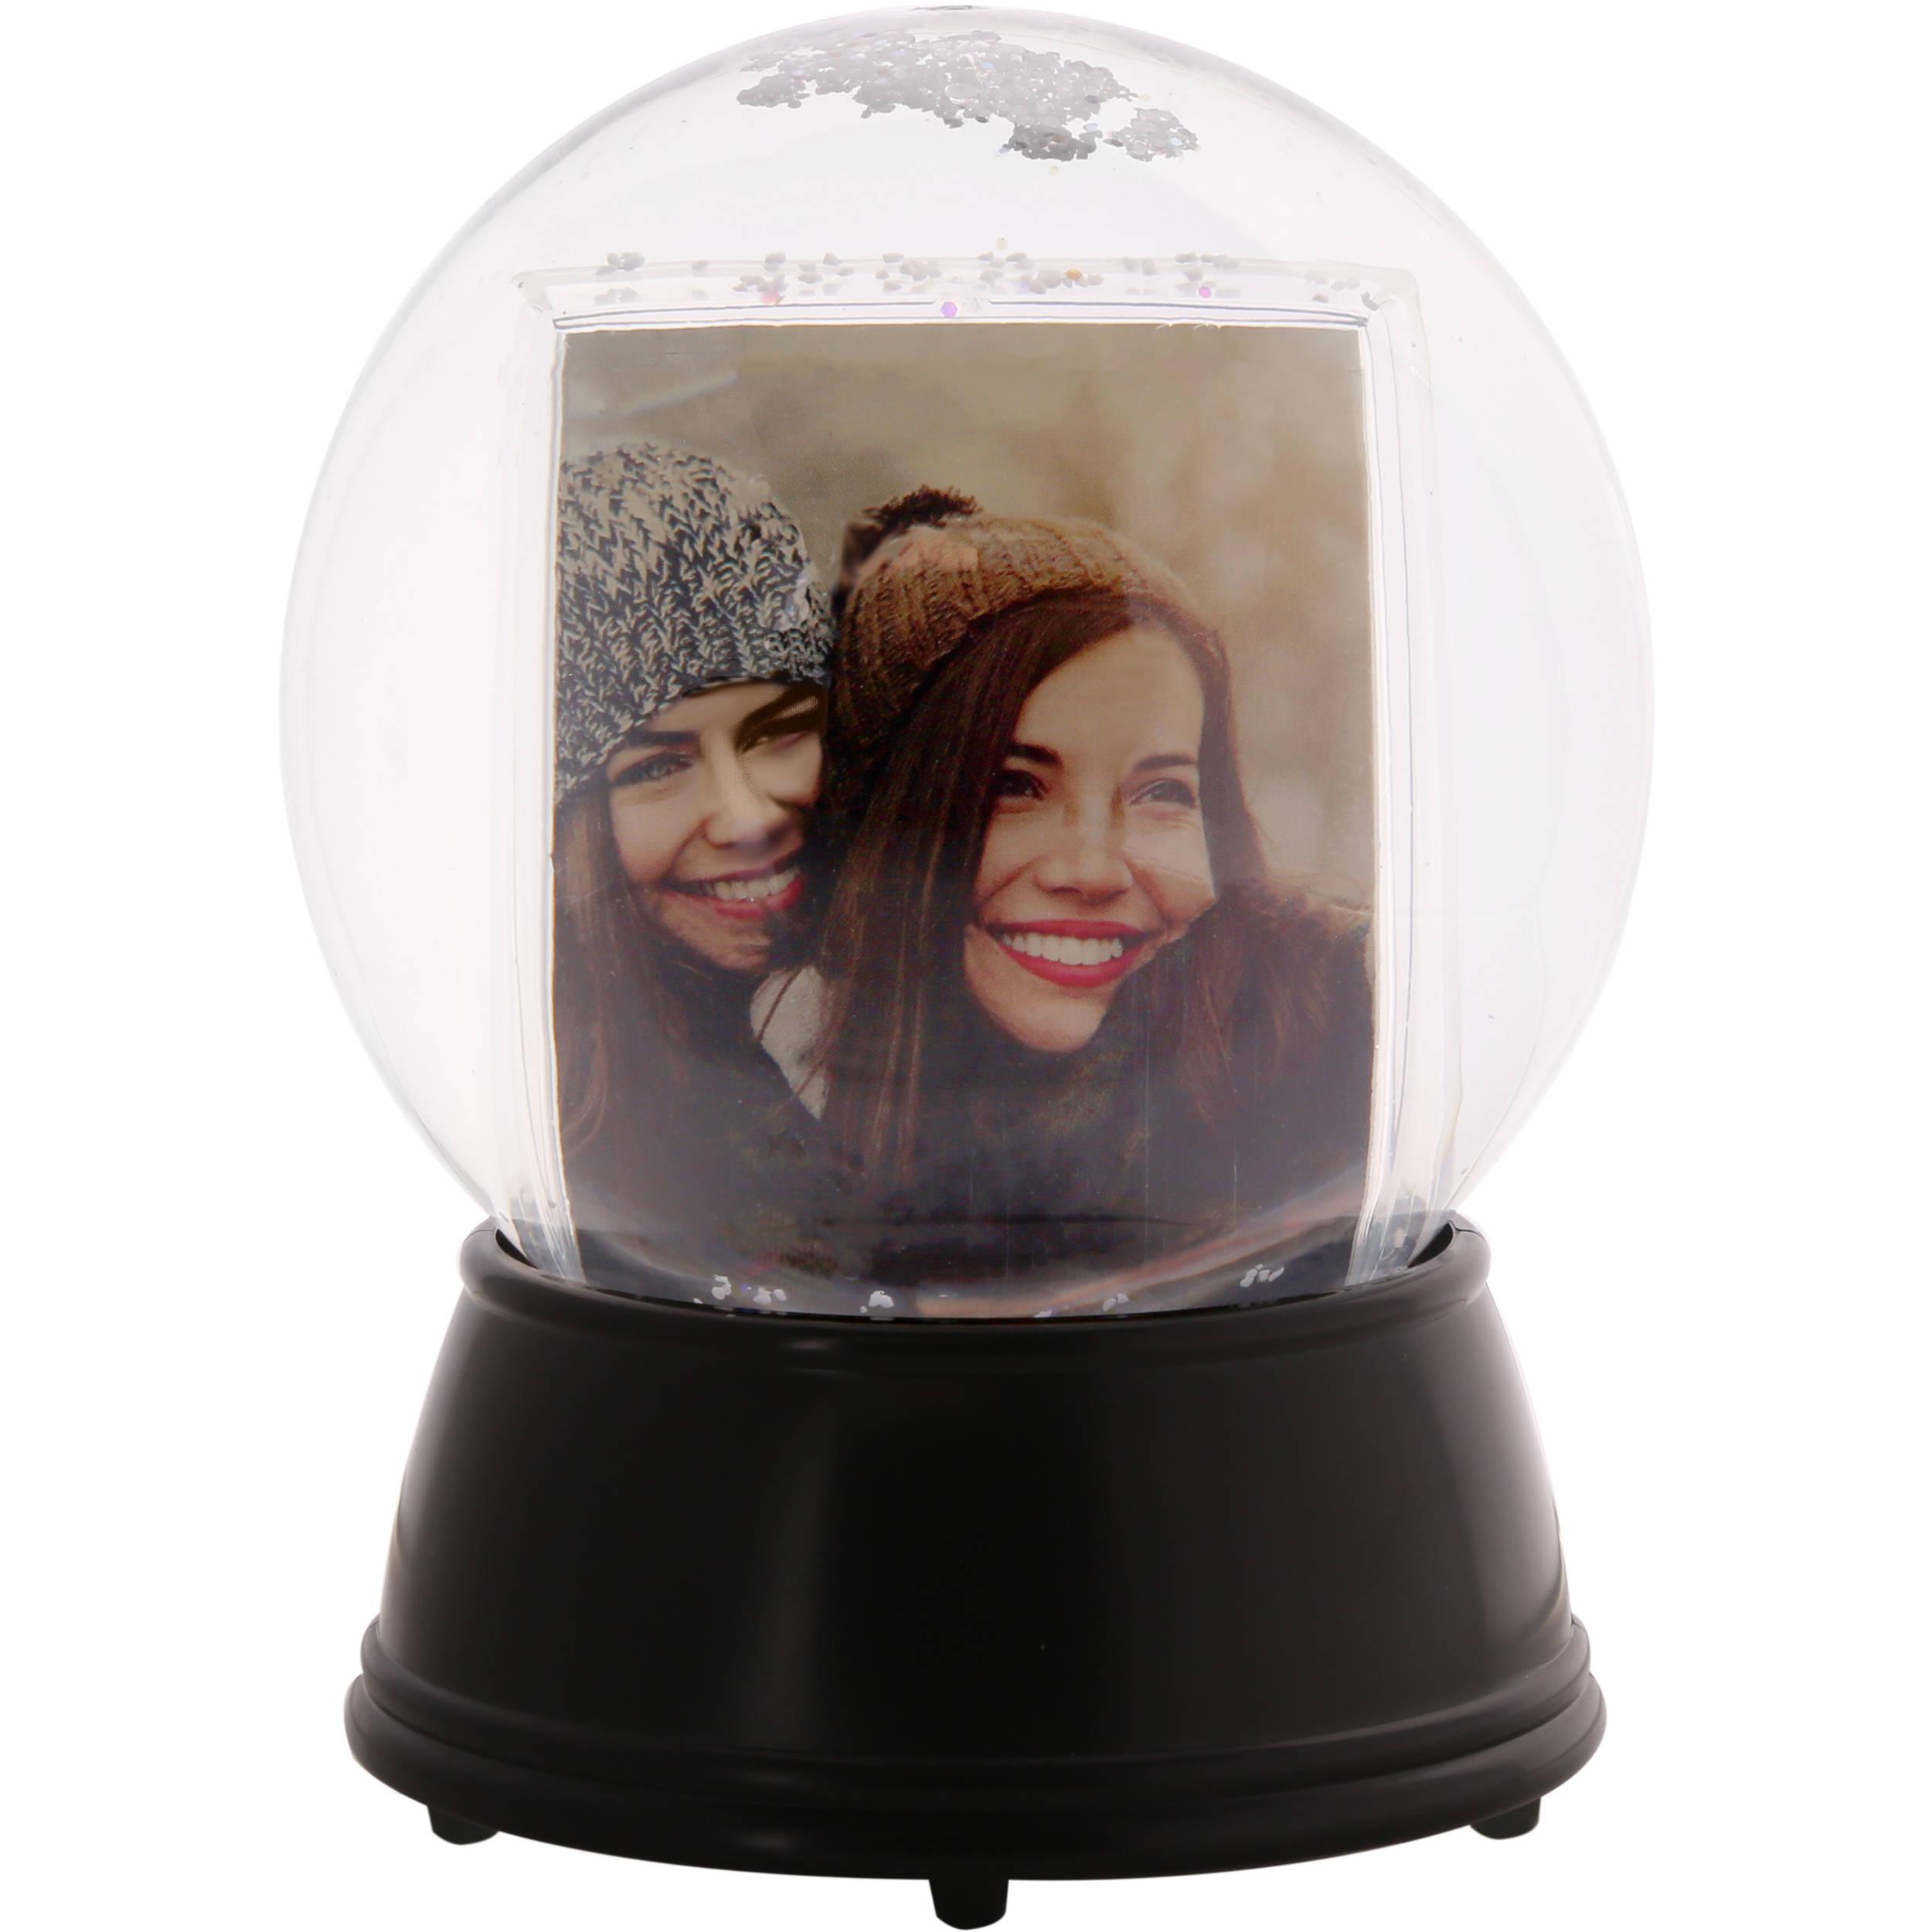 Polaroid LED Light-Up Snow Globe Photo Frame PL2X3SGSLED B&H